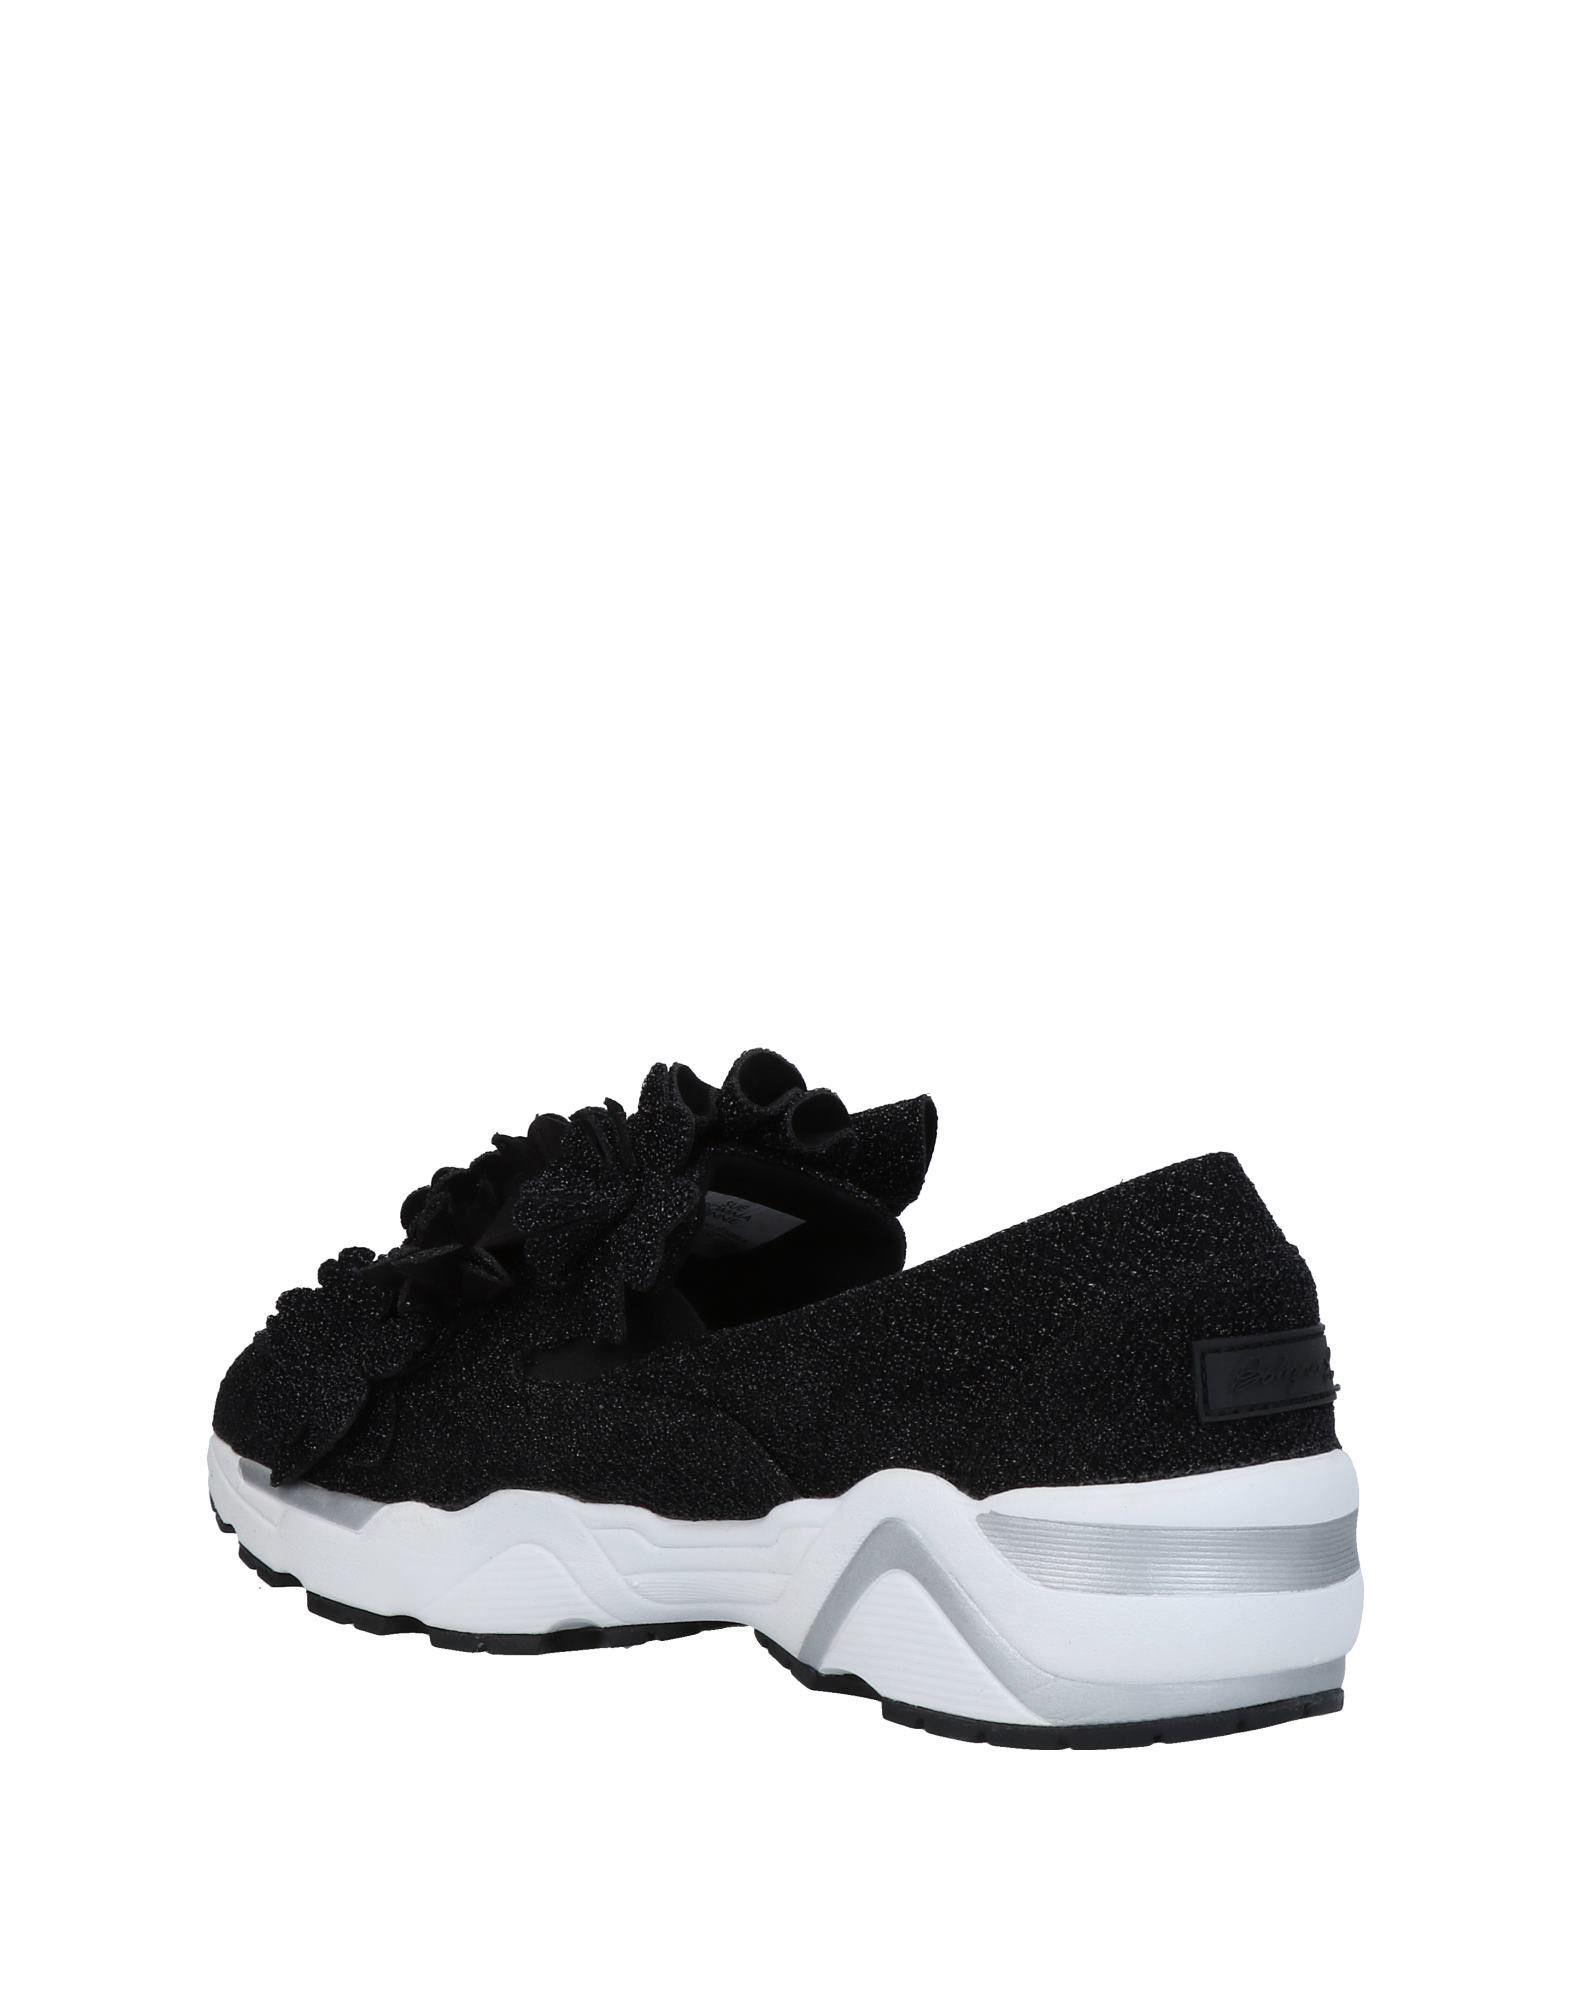 Stilvolle billige Schuhe Suecomma 11453006HR Bonnie Sneakers Damen  11453006HR Suecomma 91ef32